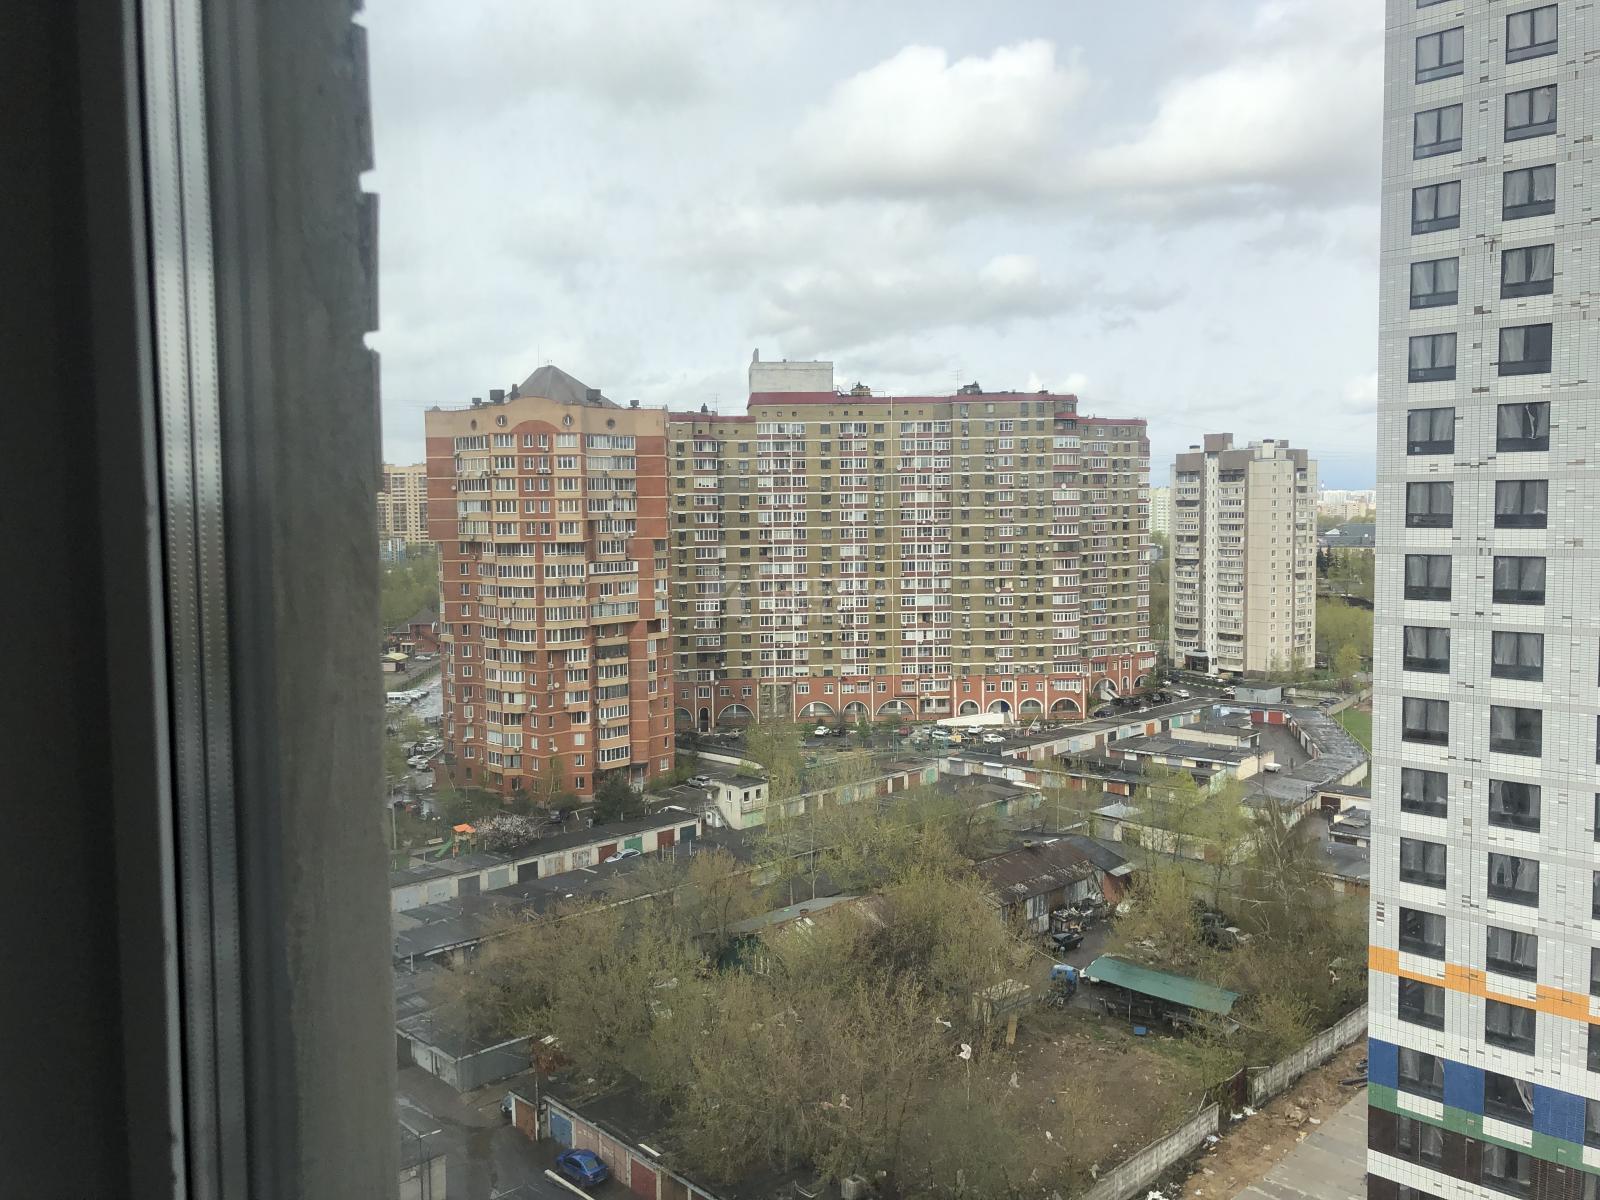 Фото №3 - 1-комнатная квартира, Люберцы, лётчика Ларюшина улица 12, метро Котельники